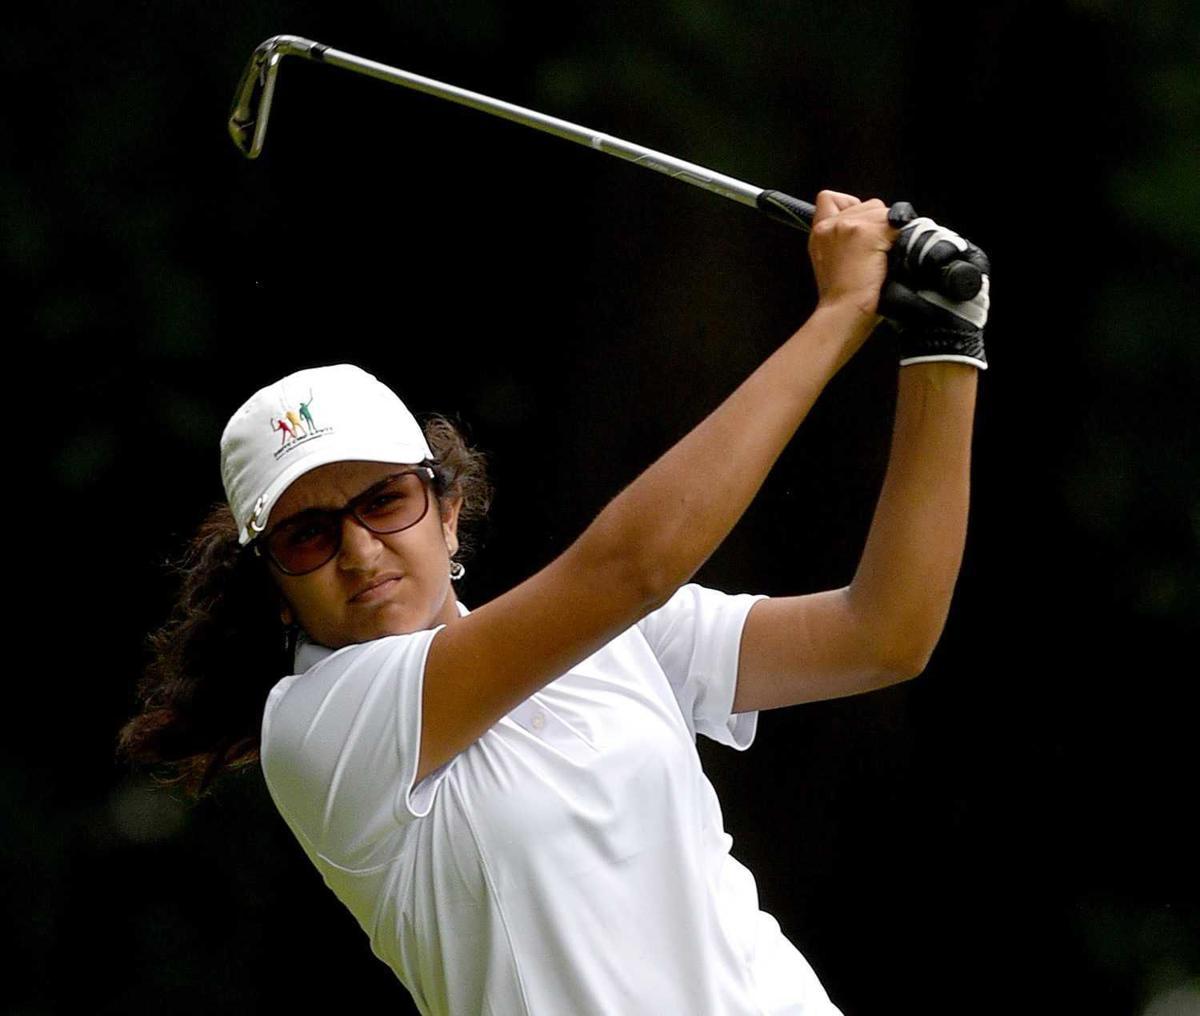 Shivani Vora, NH junior golf